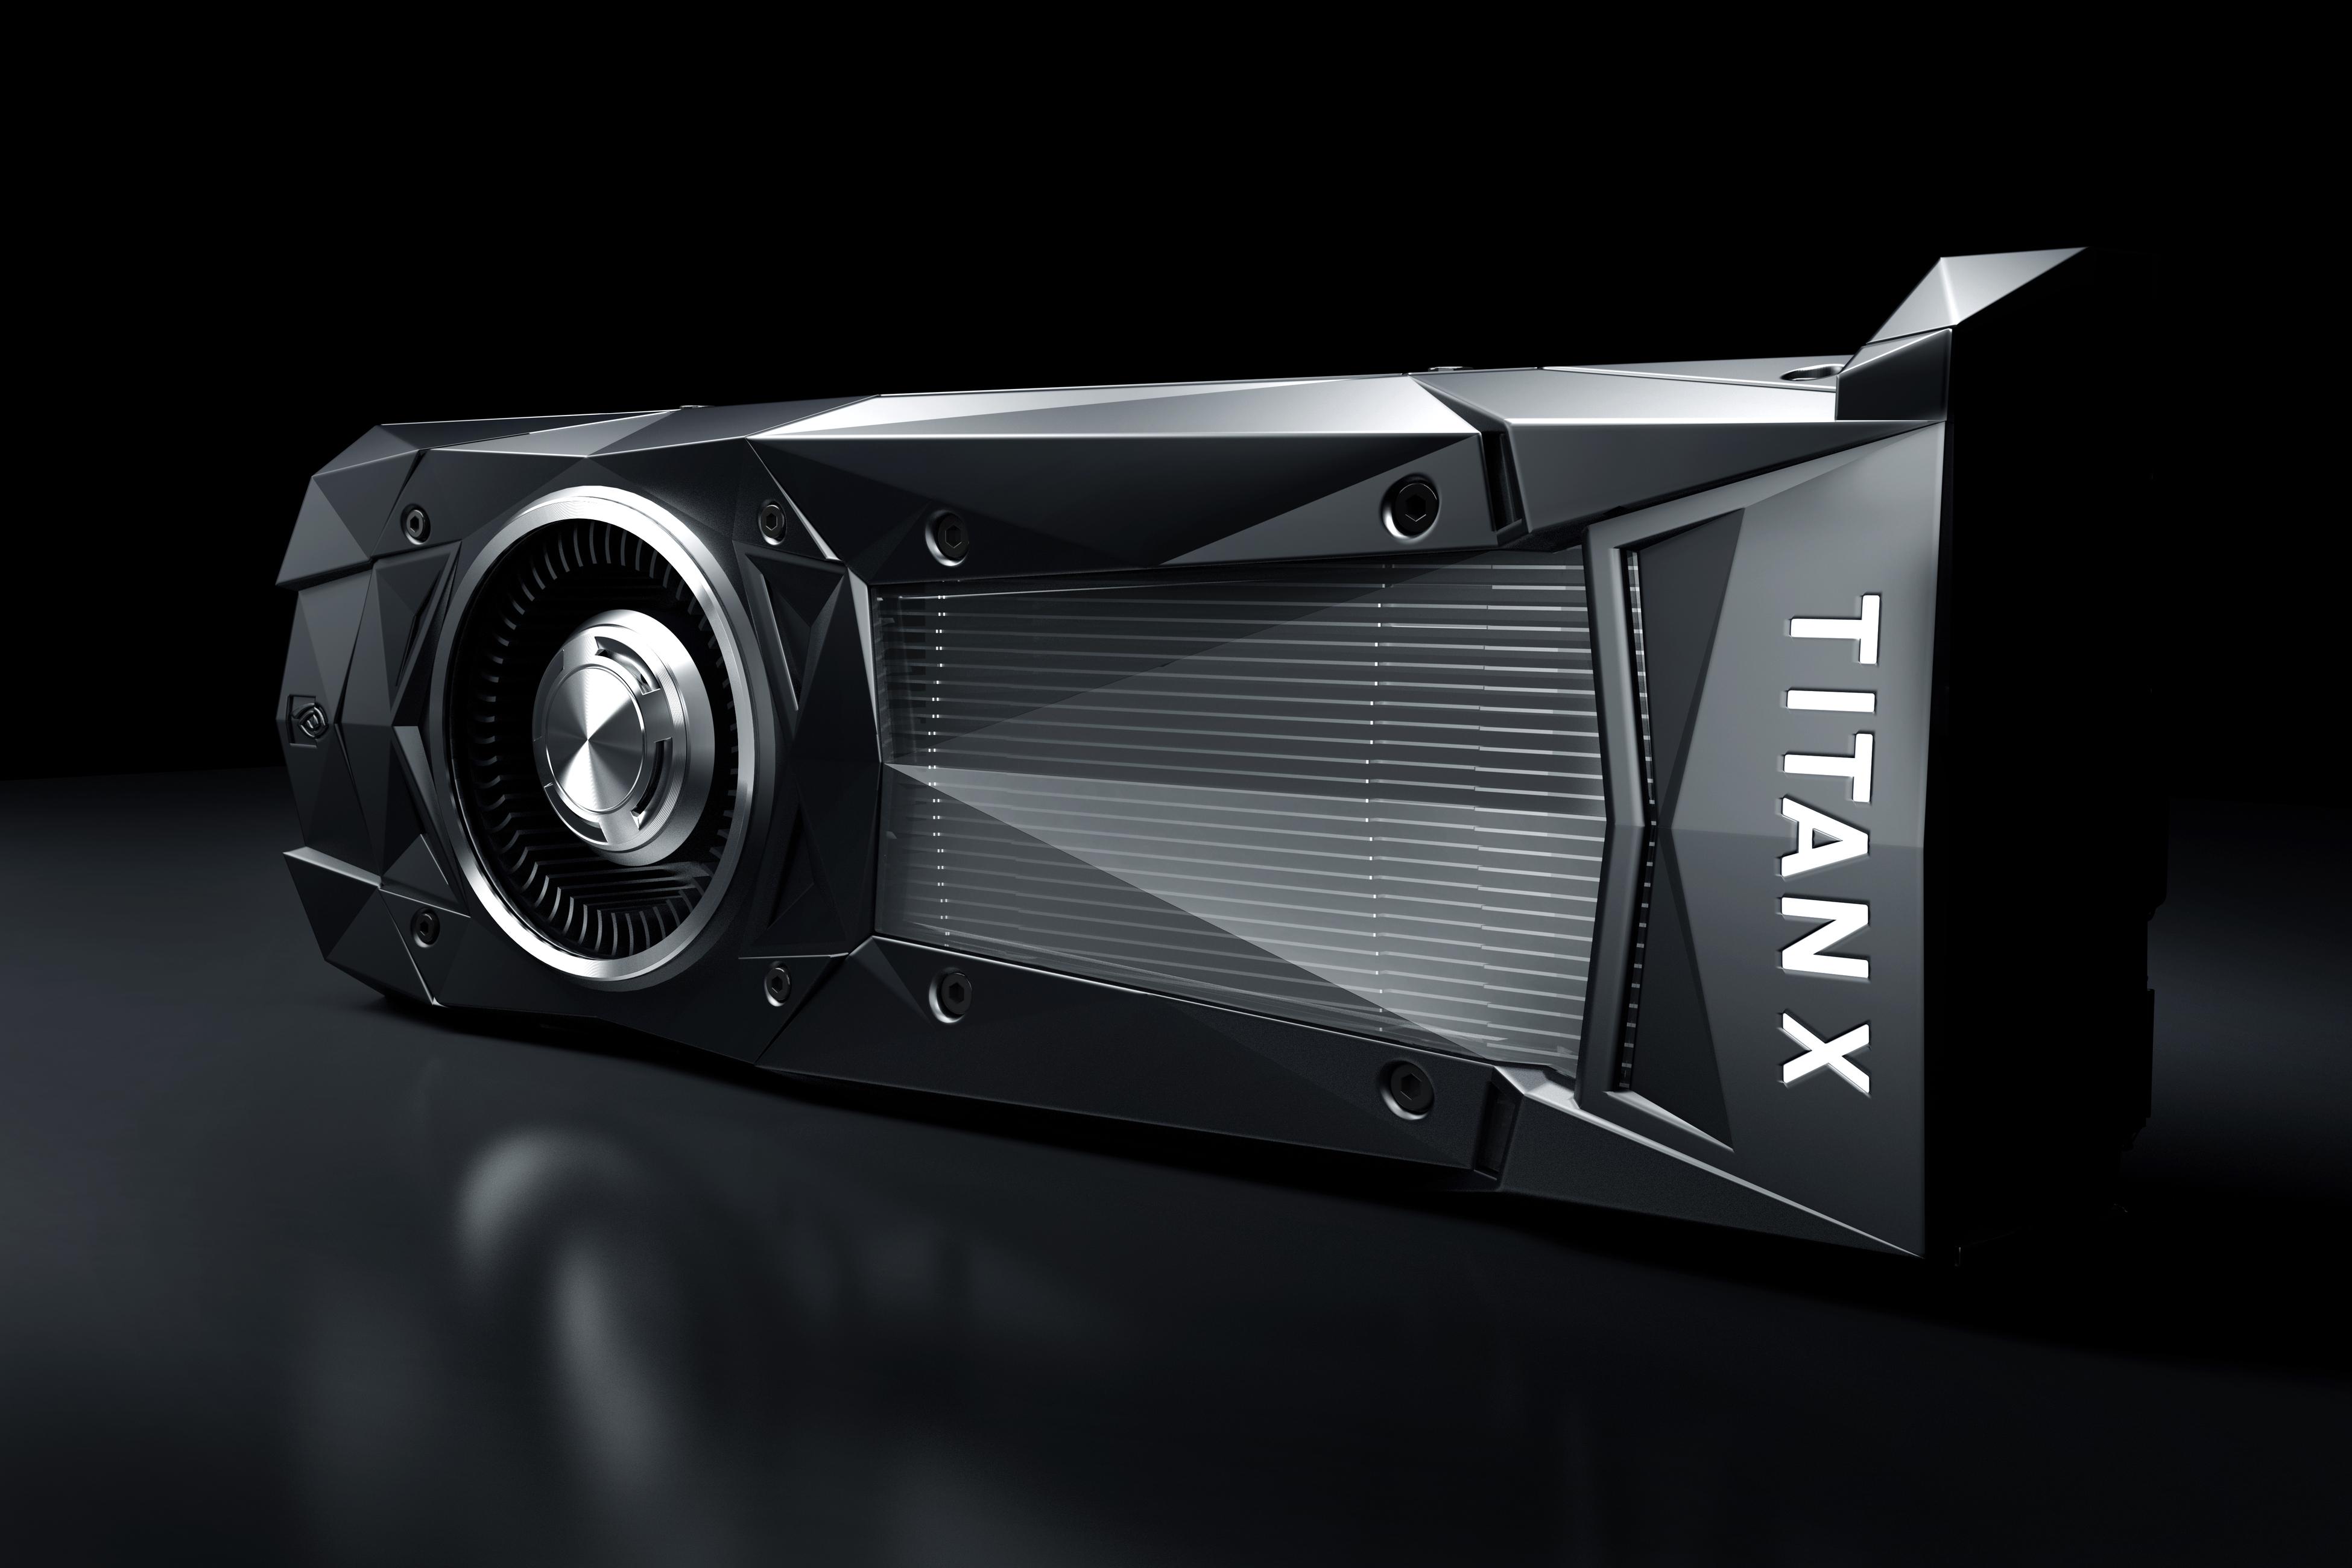 A Titan X graphics card against a black backdrop.